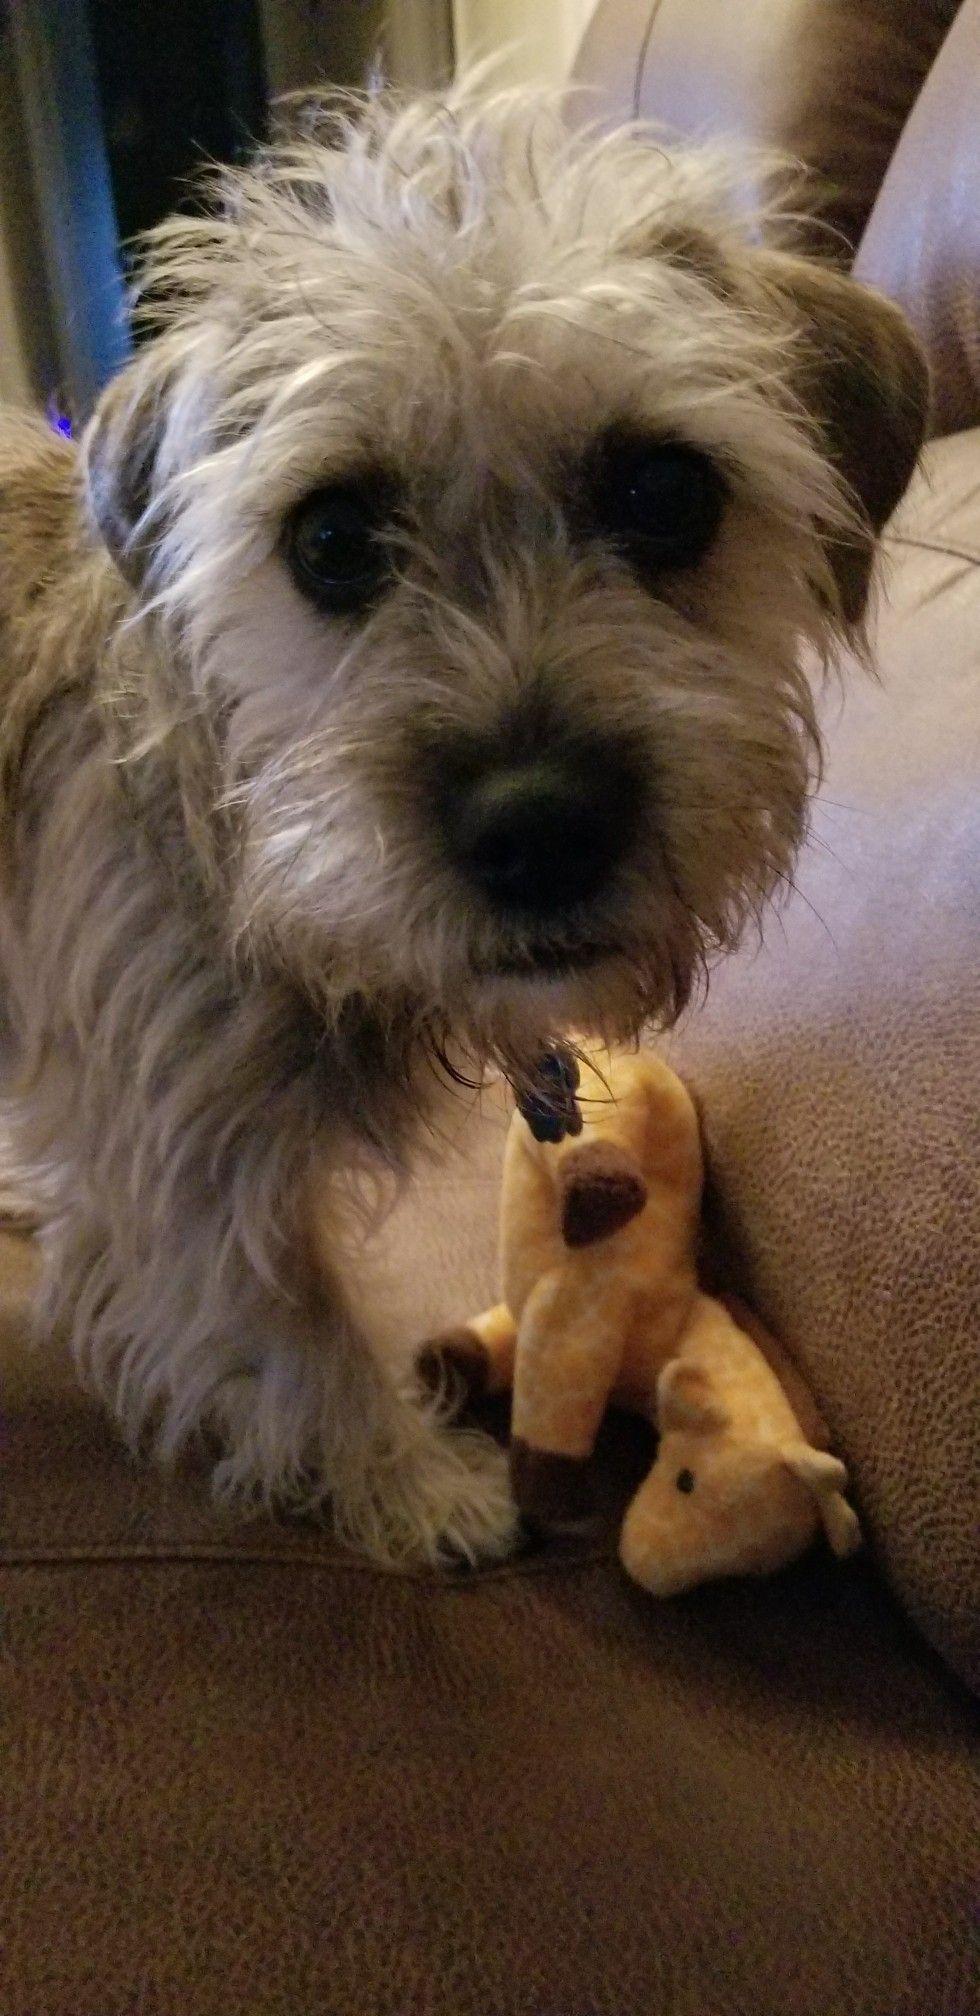 Mini Schnauzer Pug Shih Tzu Mix Scruffy Dogs Shih Tzu Mix Shih Tzu